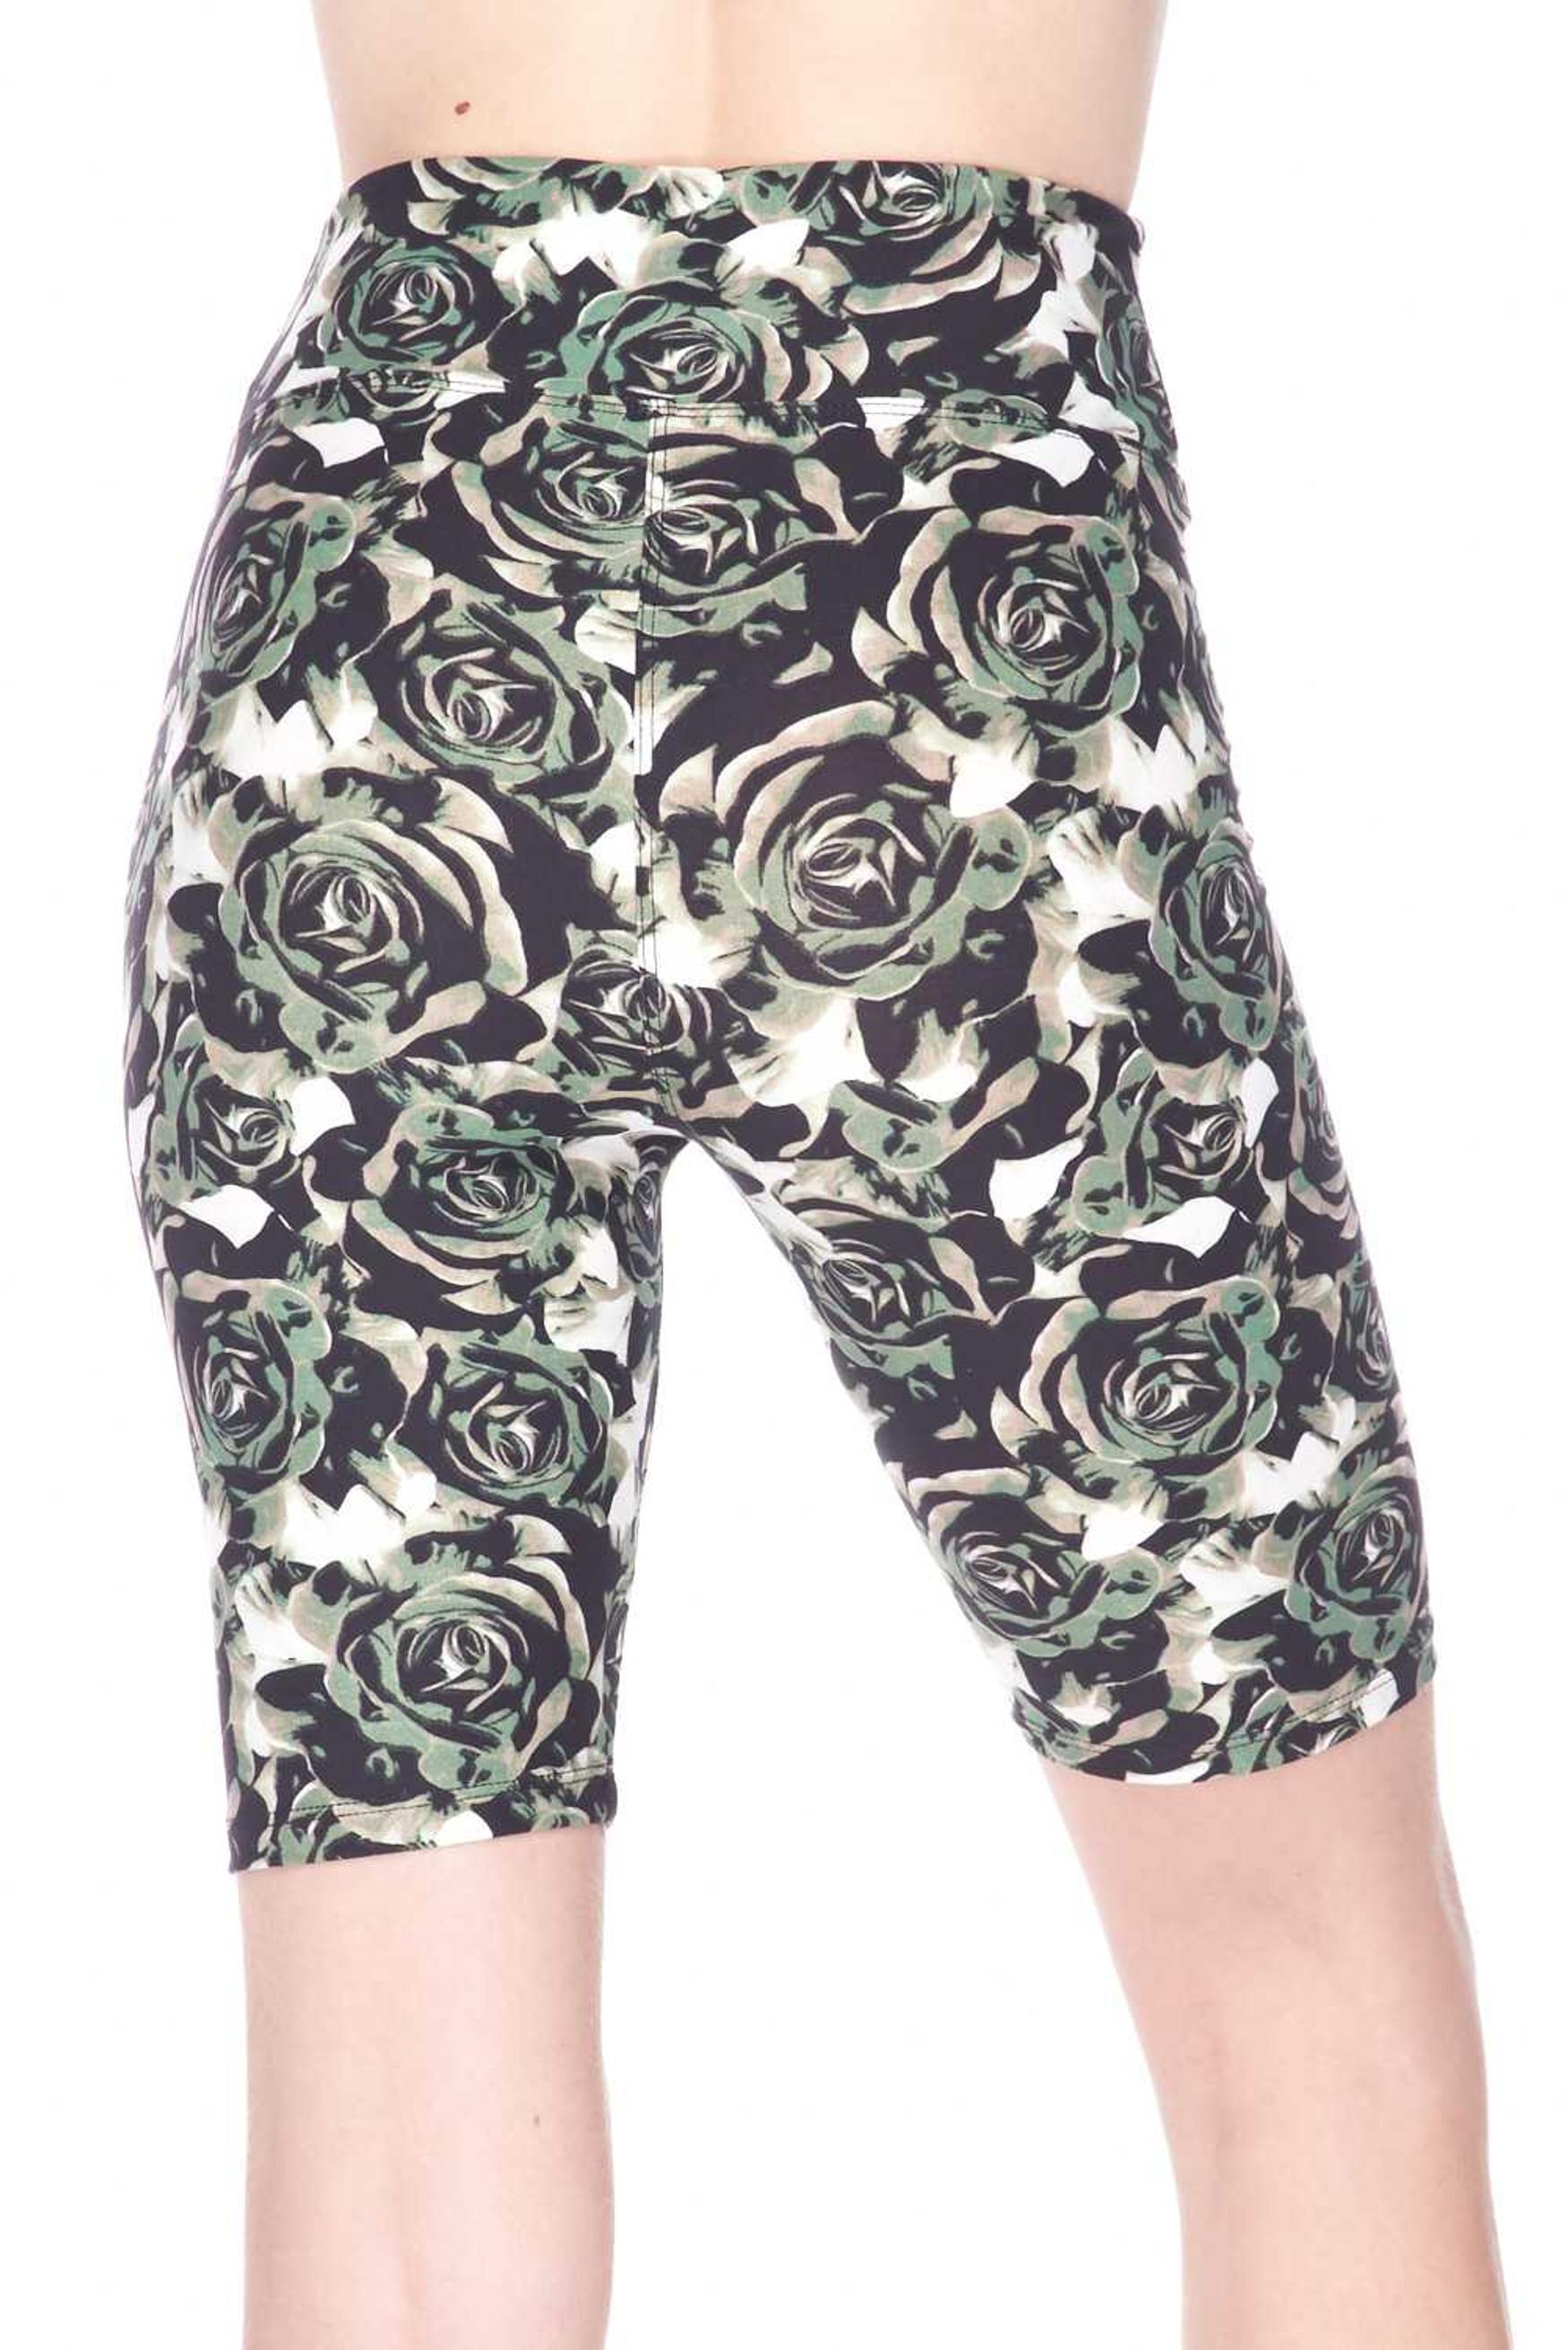 Brushed  Olive Rose Shorts - 3 Inch